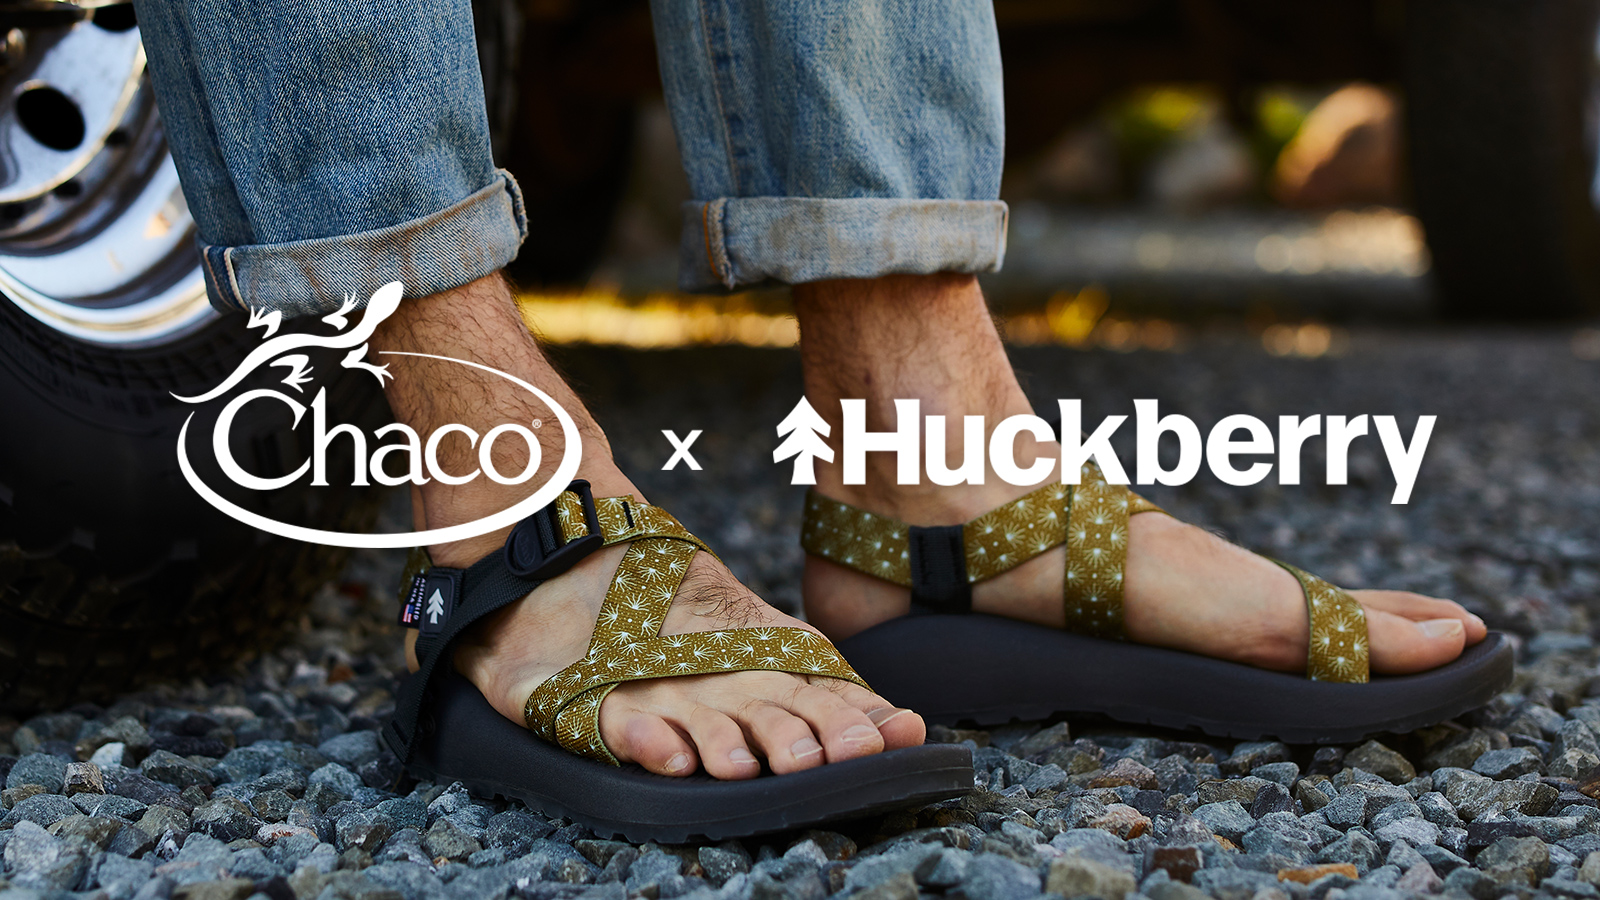 Huckberry x Chacos